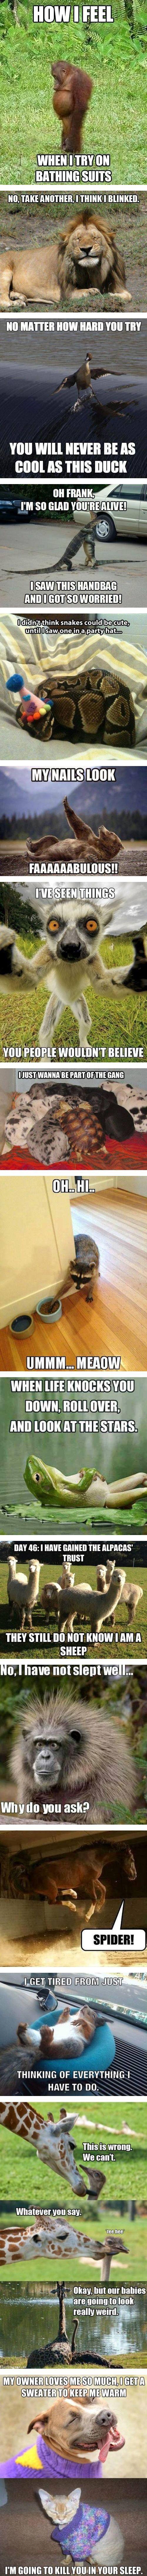 The best animal memes